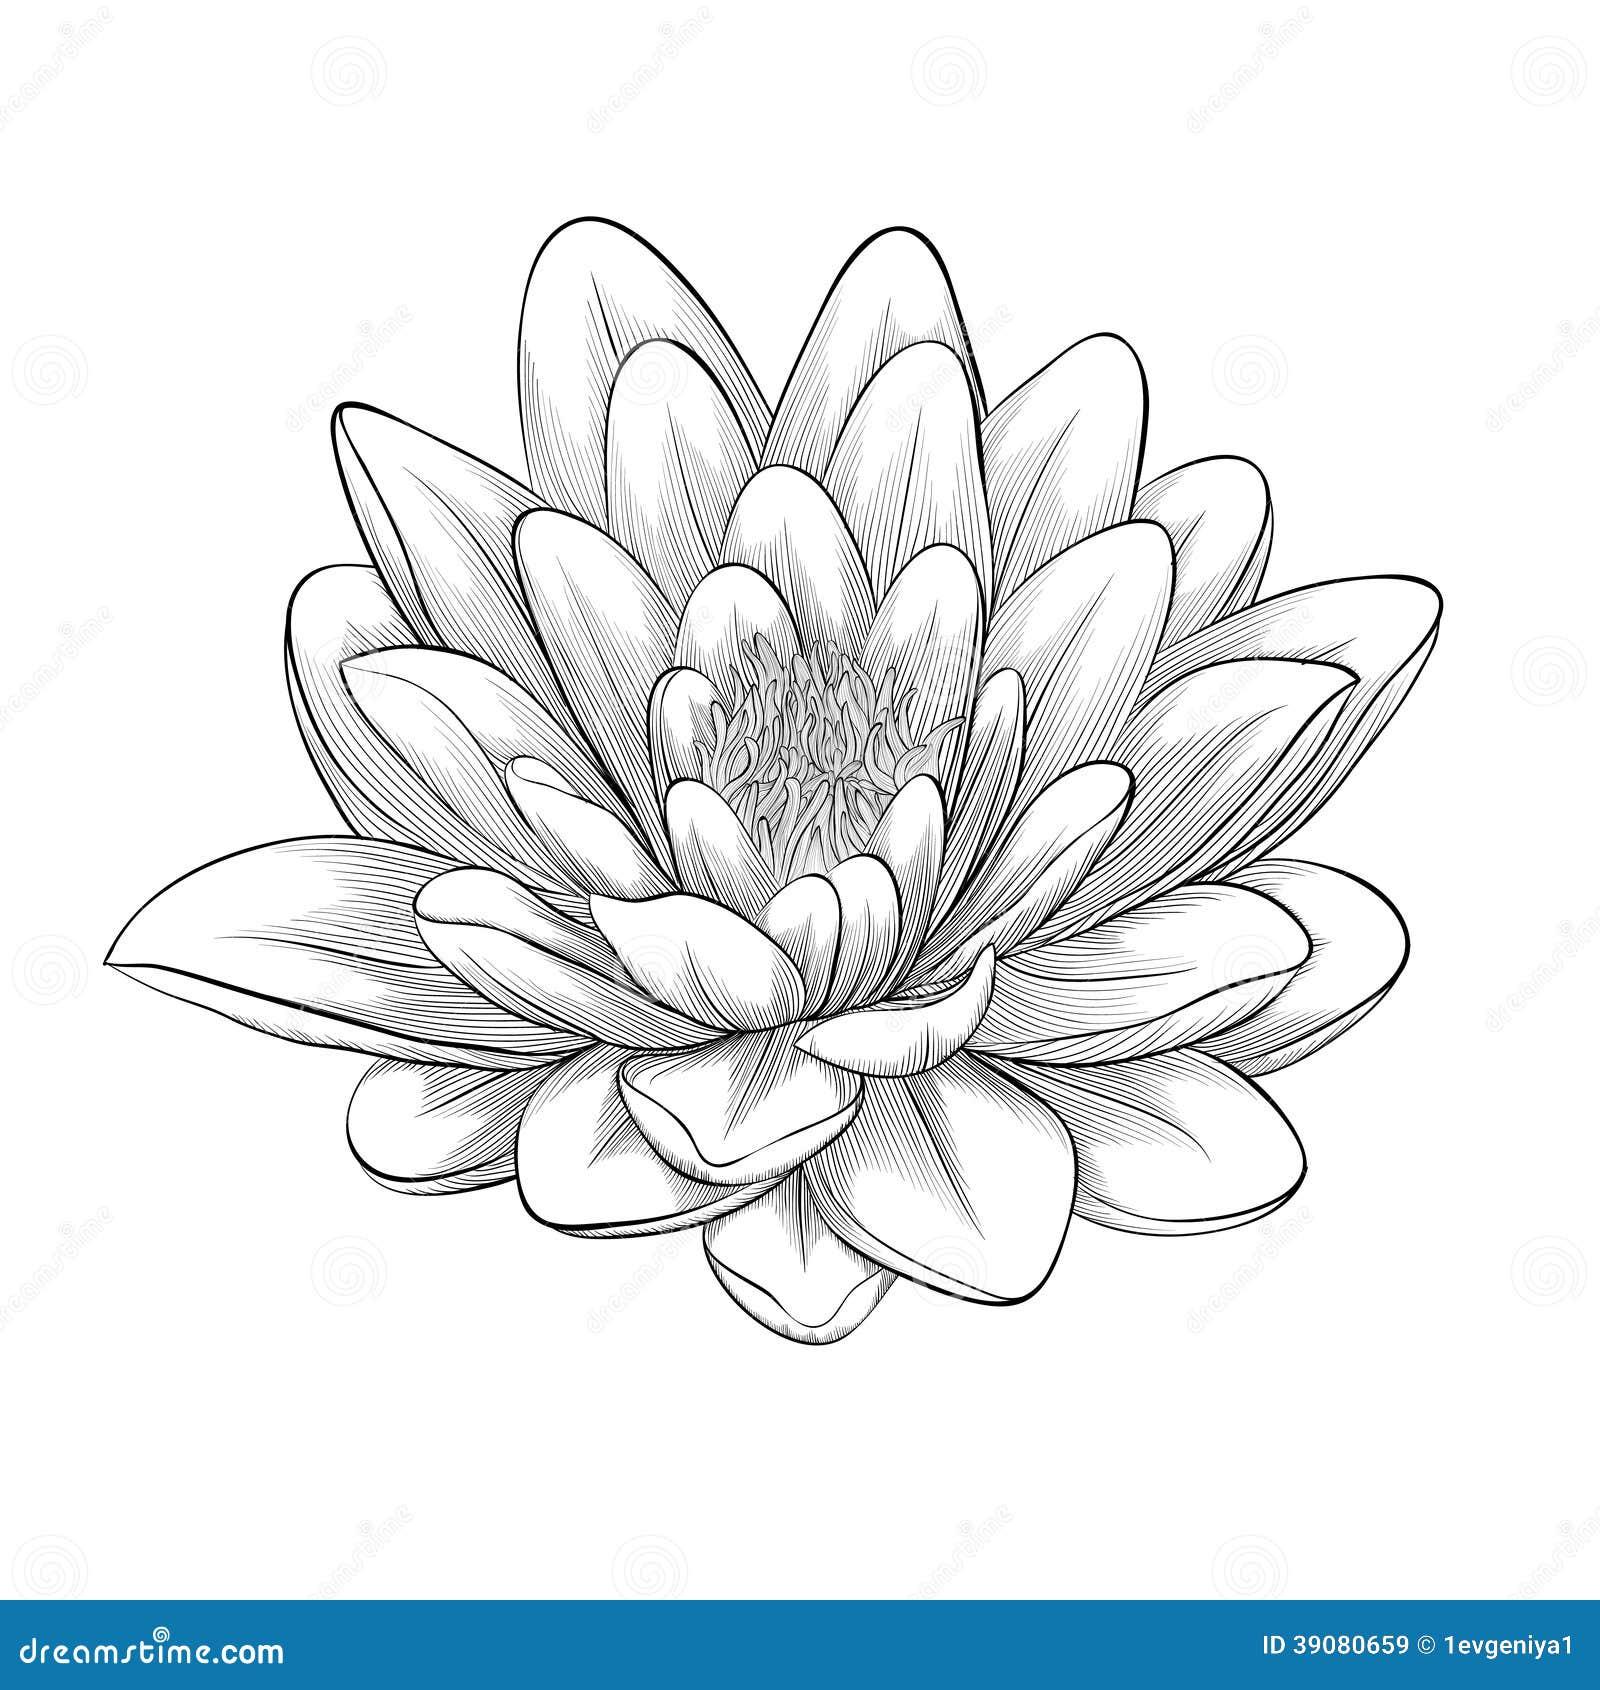 Black And White Lotus Flower Isolated Illustration 39080659 Megapixl